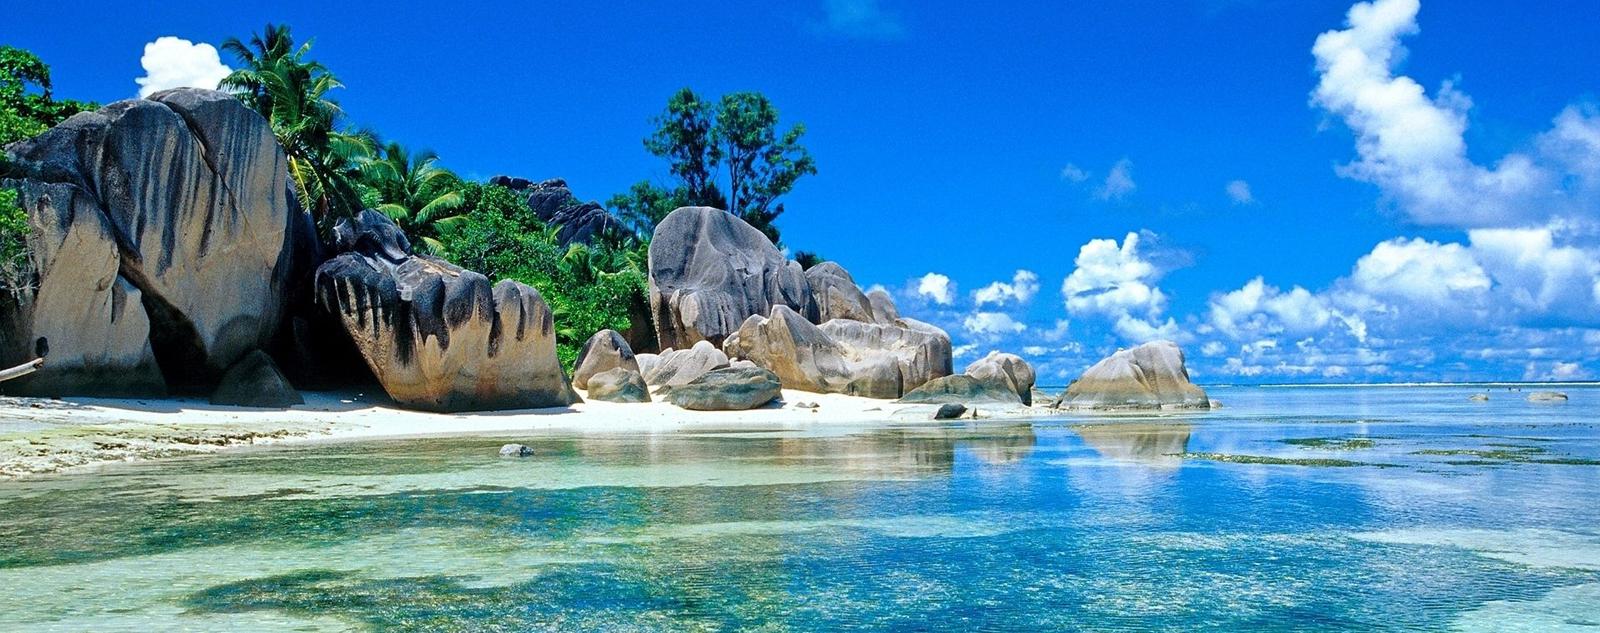 srilanka slide3